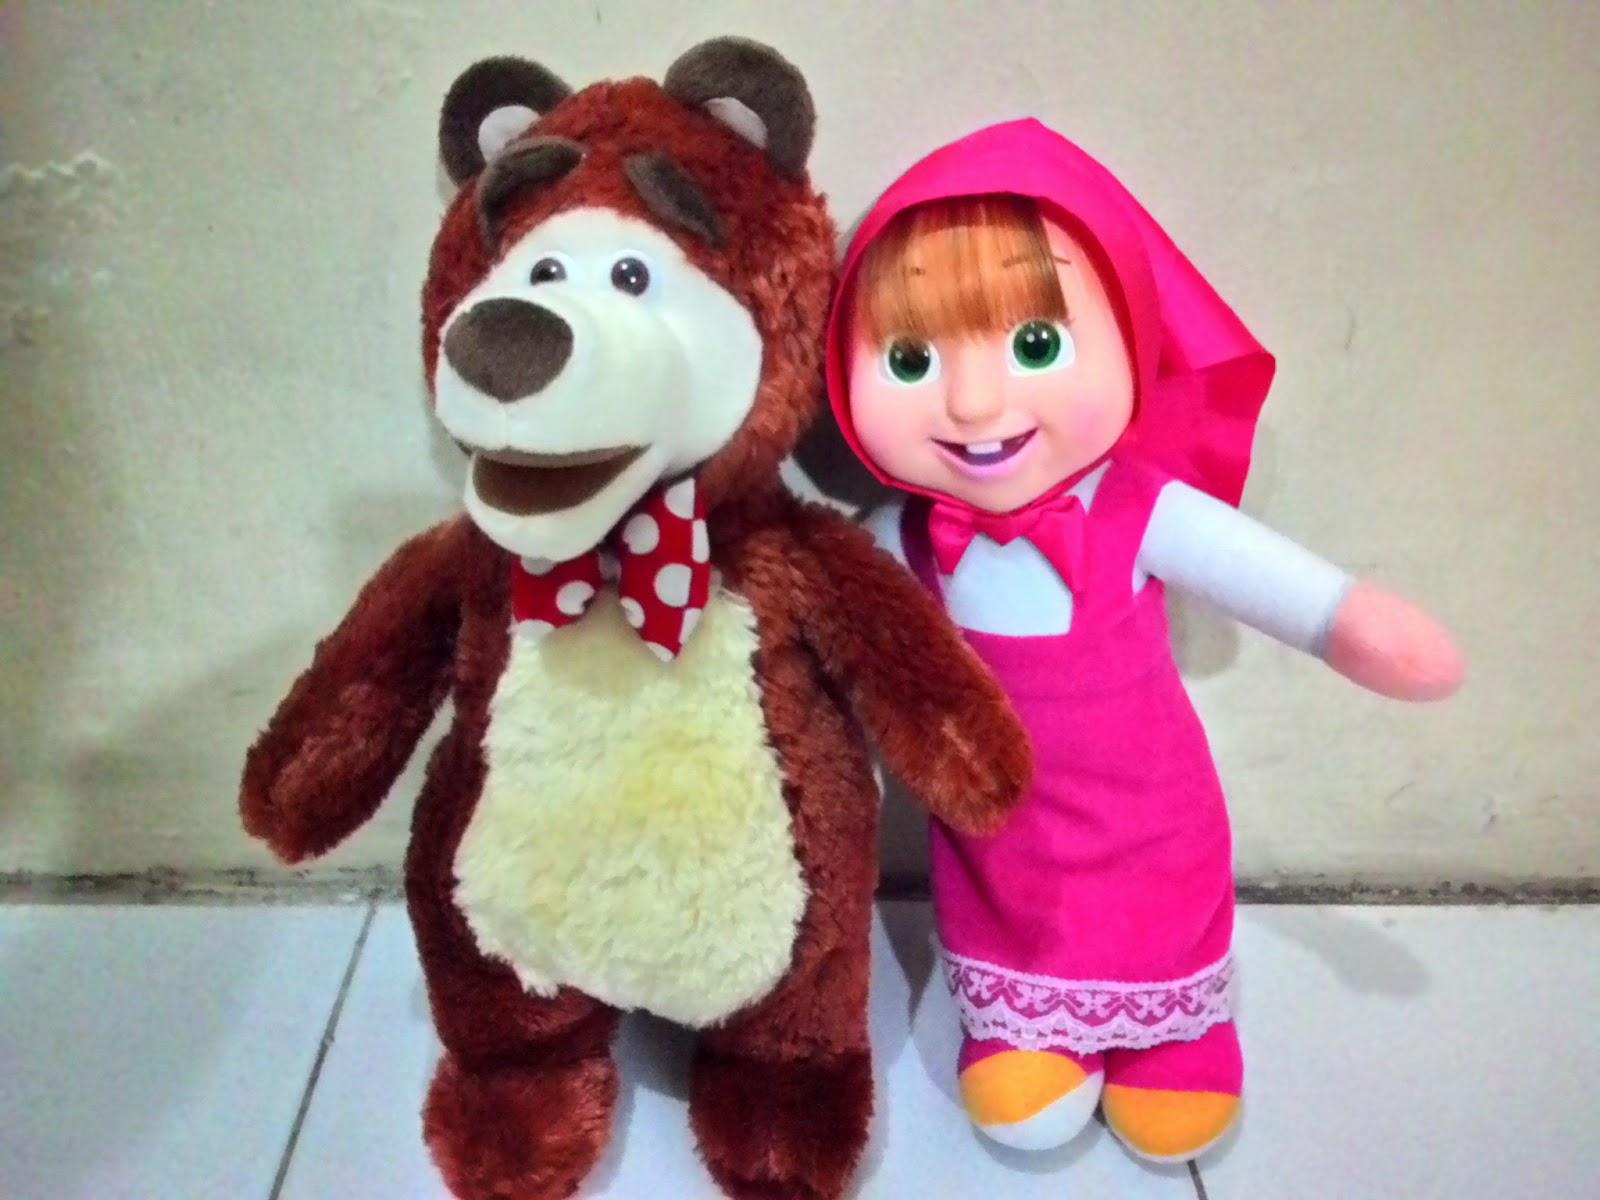 Kumpulan 16 Gambar Boneka Masha Lucu Terbaru Untuk Anak Si Gambar